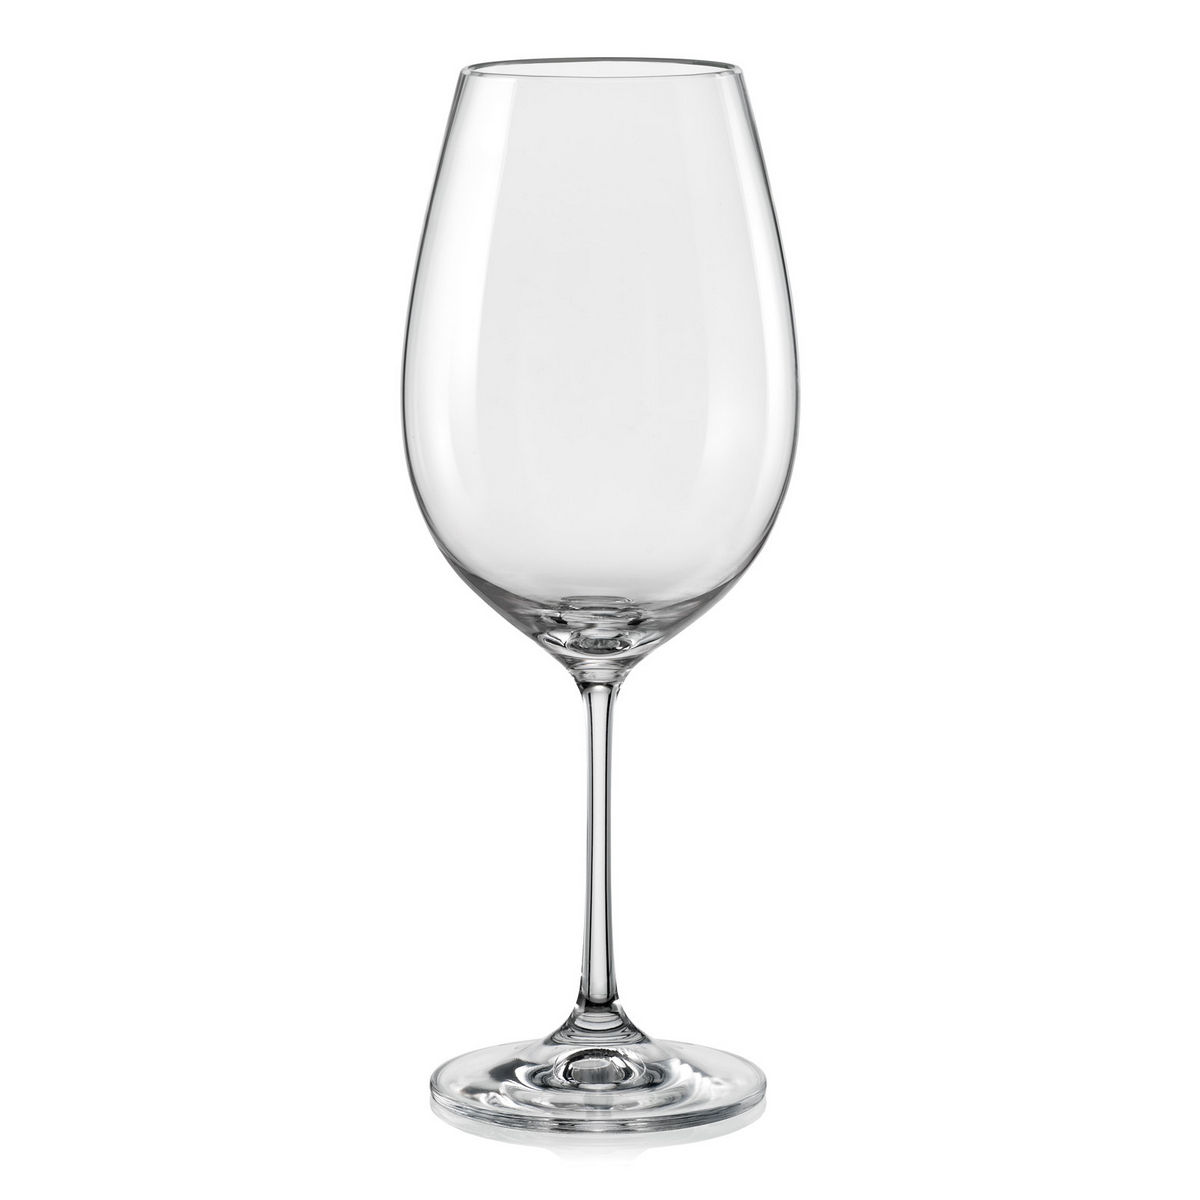 Bar Set 4 Pahare Cristalin Vin 550 Ml 2021 aranjareamesei.ro